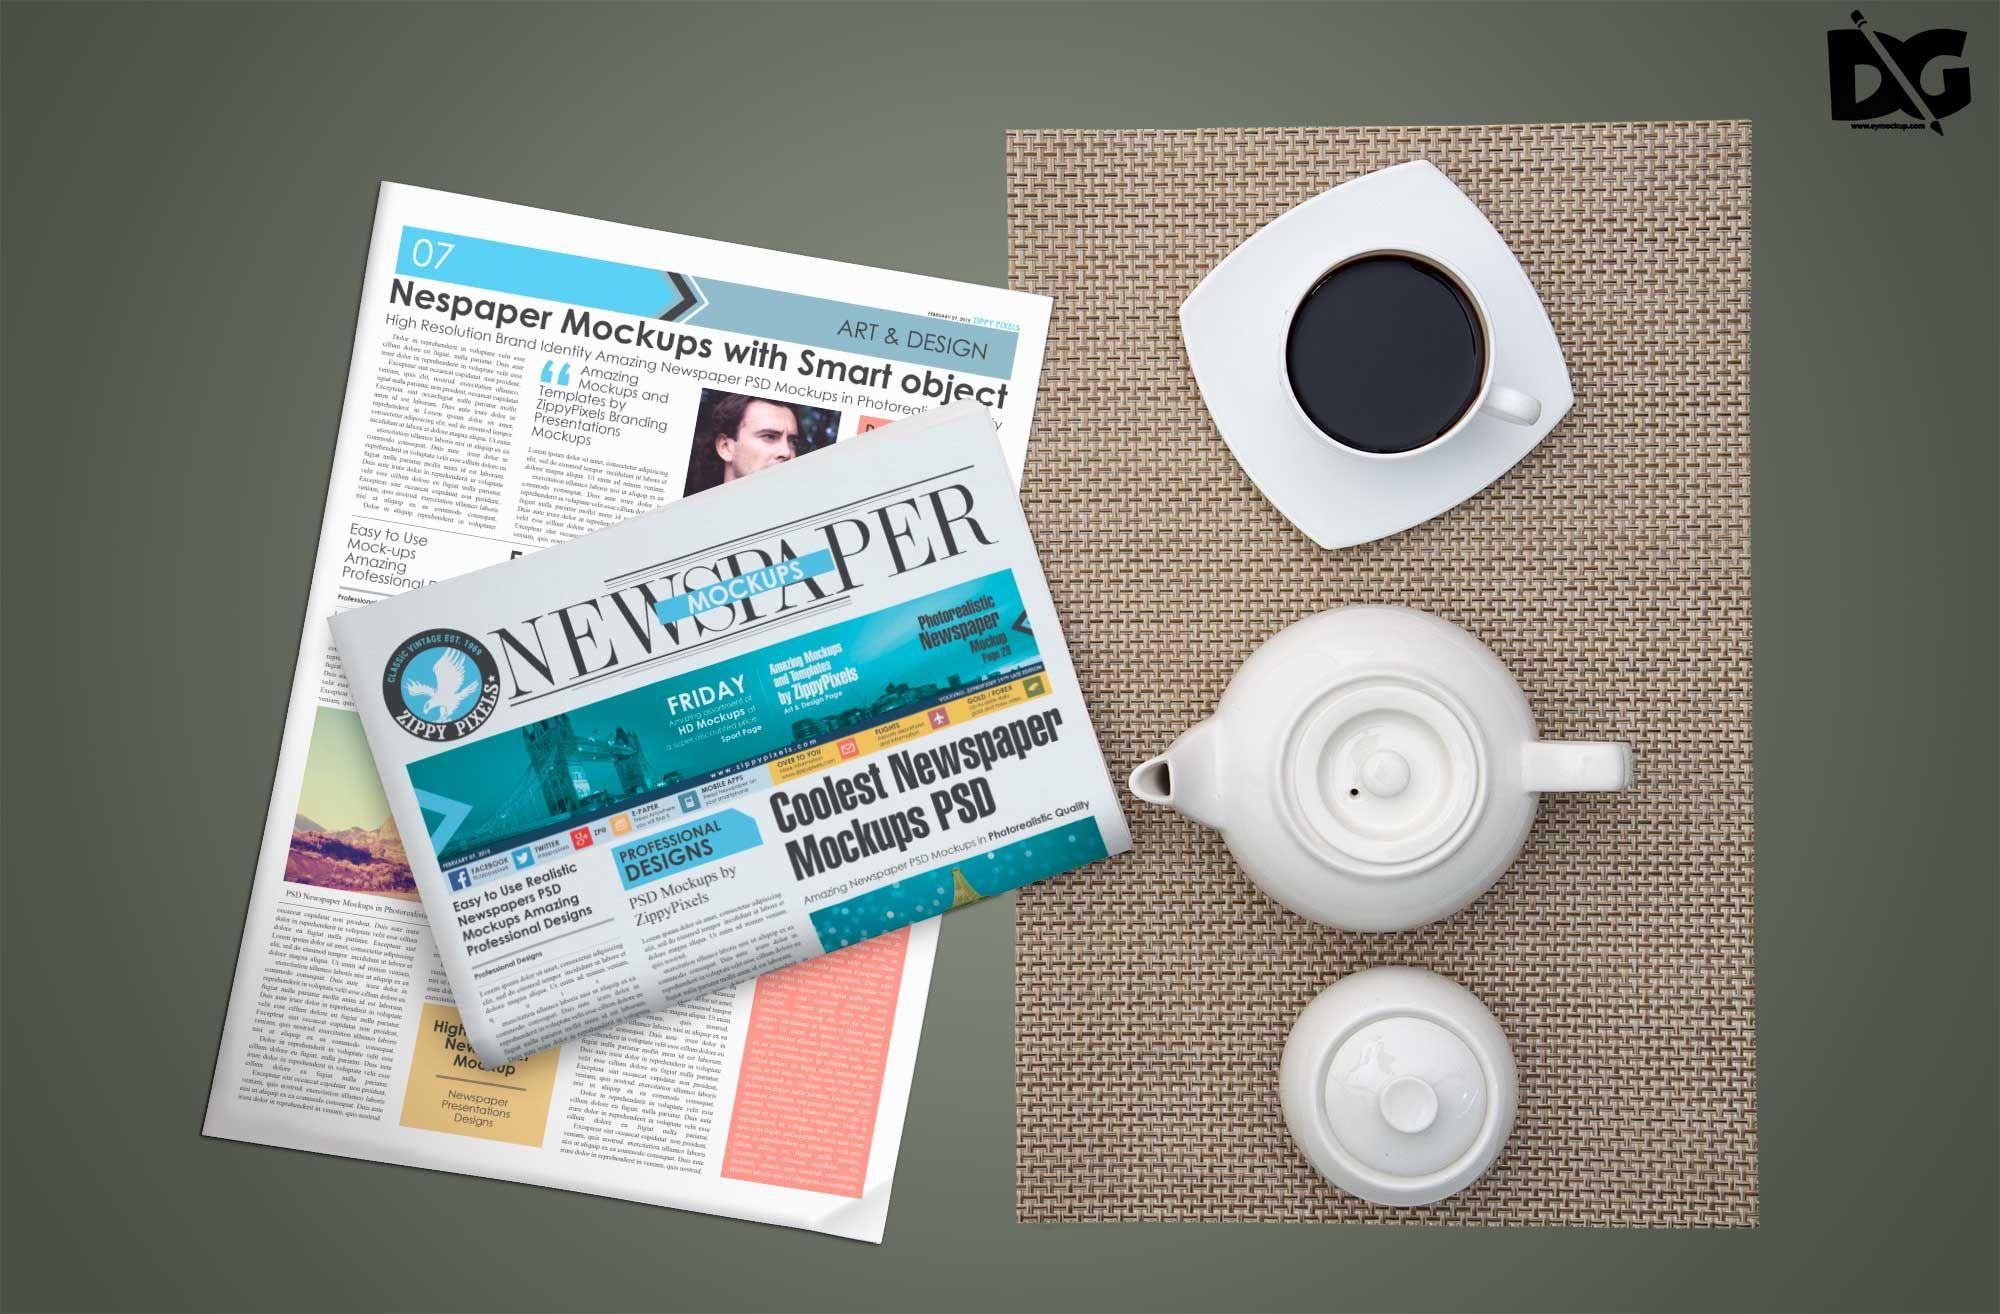 Free Morning Newspaper Coffee Designs Mockup Coffeedesignsmockup Coffeemockup Designsmockup Mockup Pape Logo Design Mockup Design Mockup Free Mockup Design